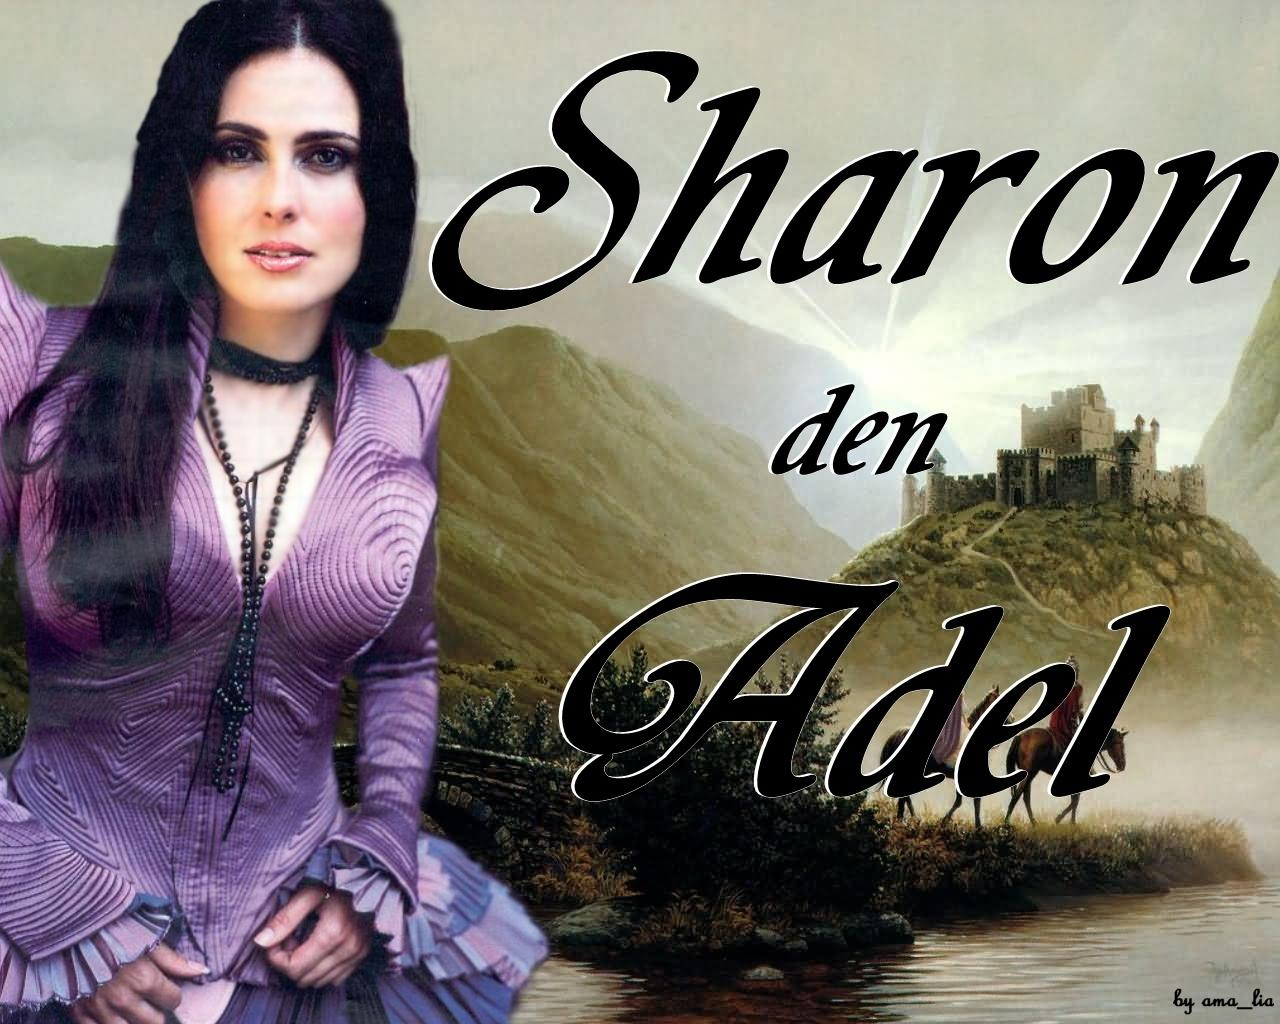 http://4.bp.blogspot.com/-TltyxK6Qvco/TfjxaEopKYI/AAAAAAAADls/Nv0B4rHQ_2A/s1600/Sharon-Den-Adel-within-temptation.JPG